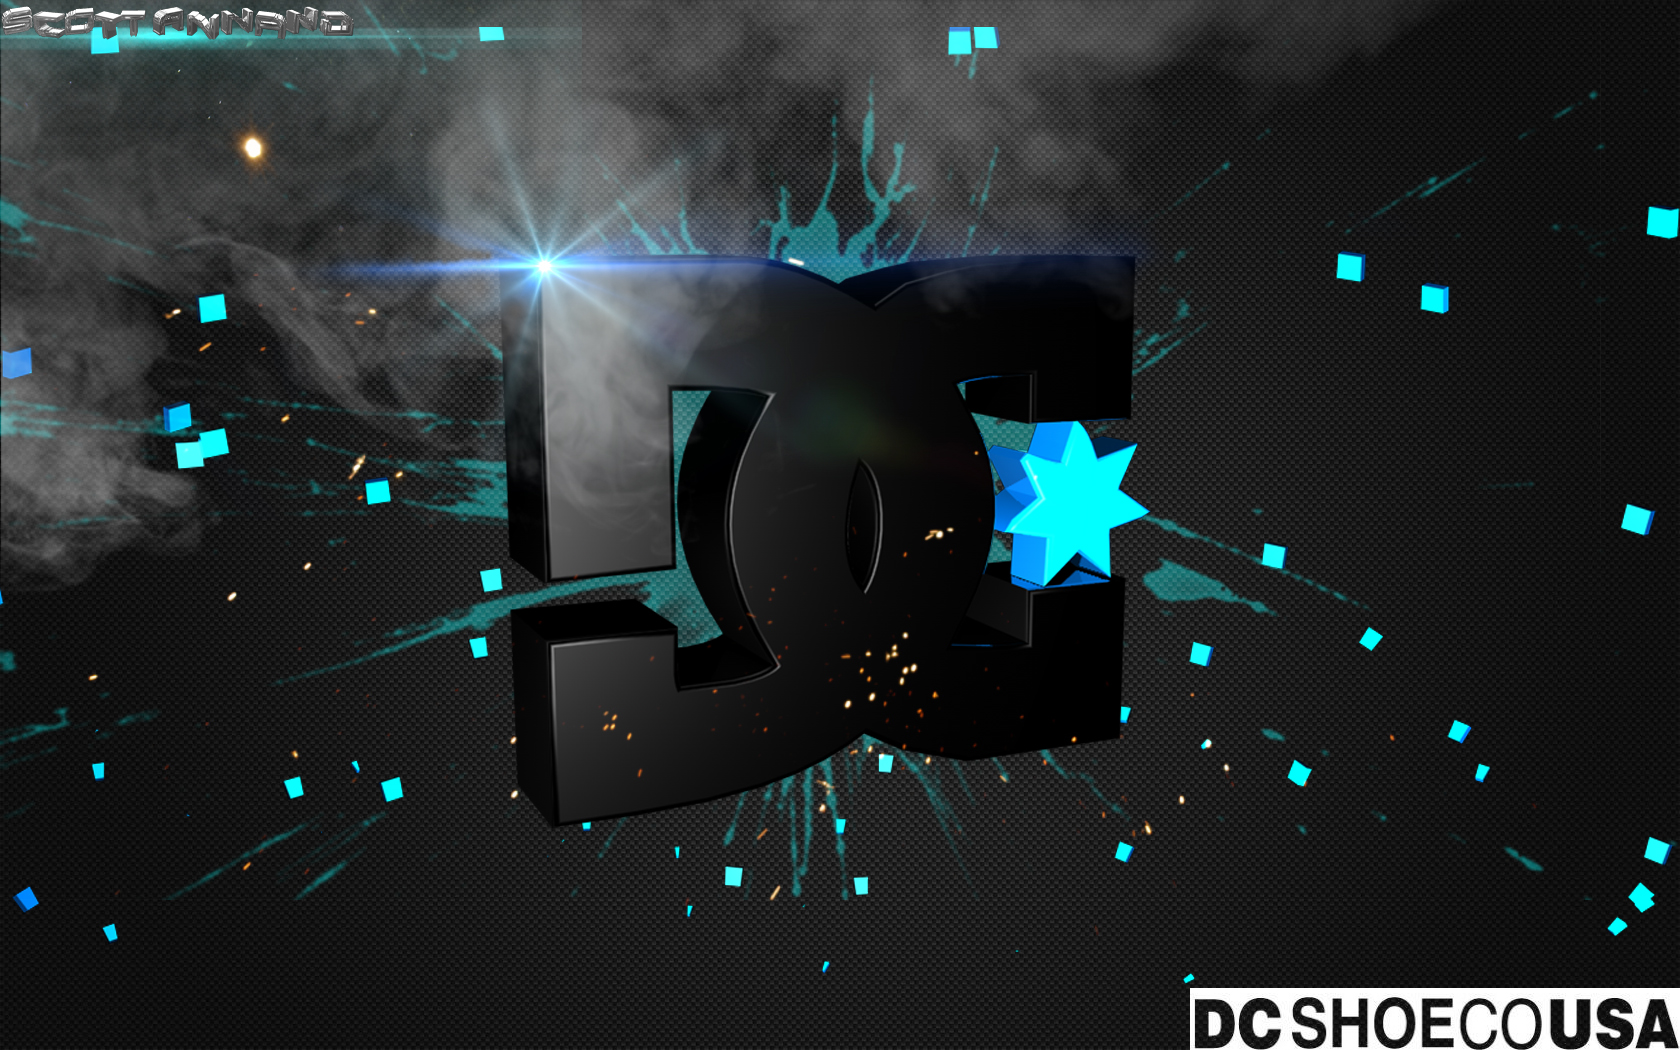 Dc shoes logo wallpaper HD   Imagui 1680x1050